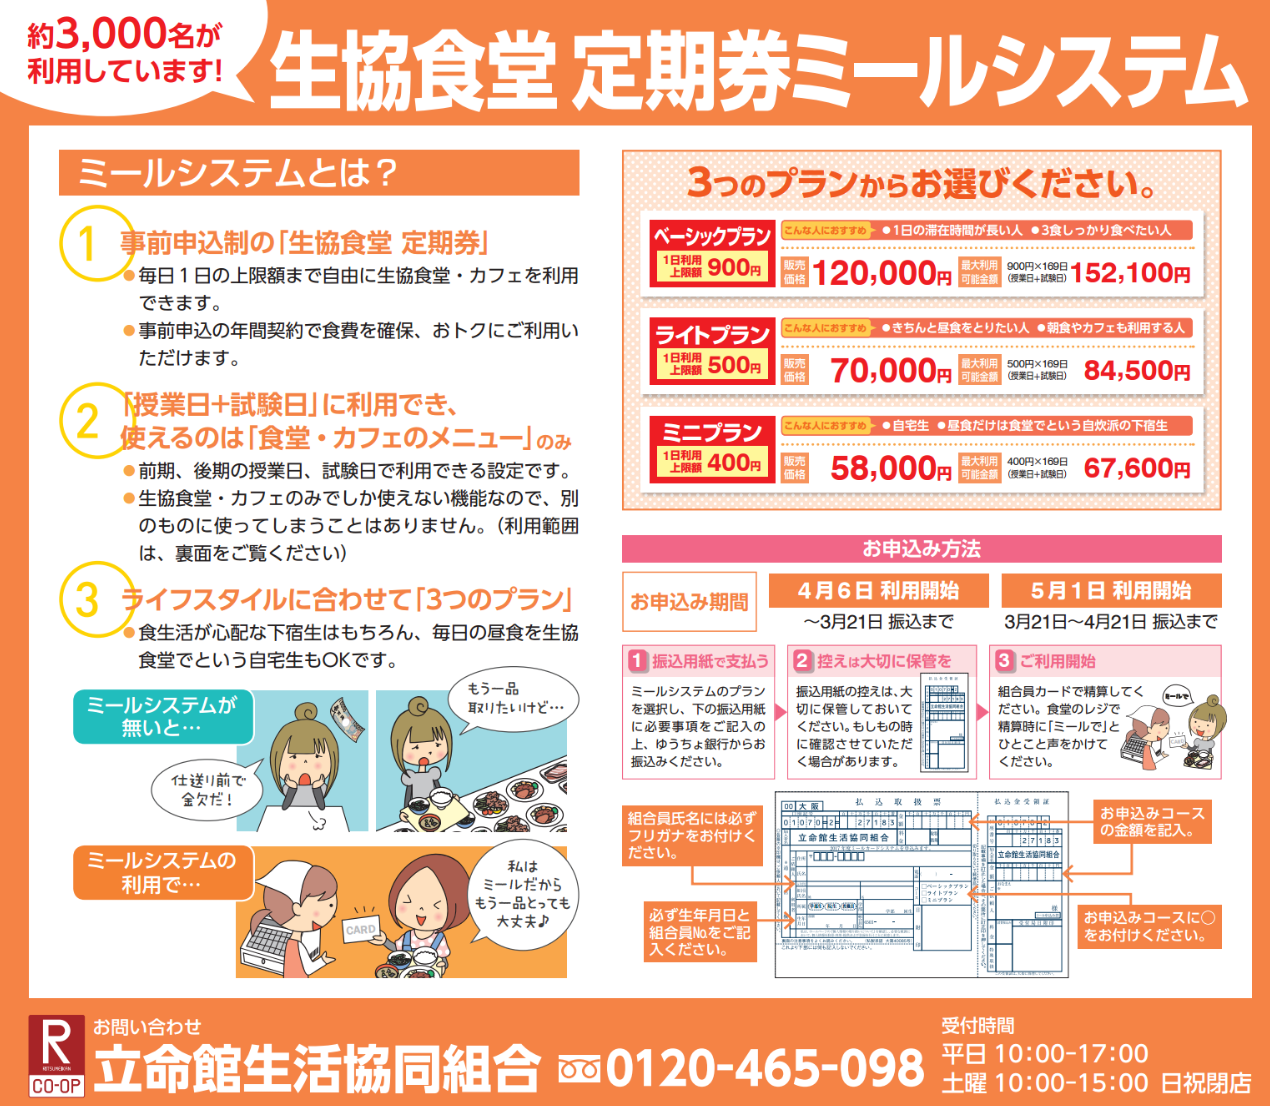 http://www.ritsco-op.jp/pickup/Screenmemo_2017-02-17-15-49-16.png